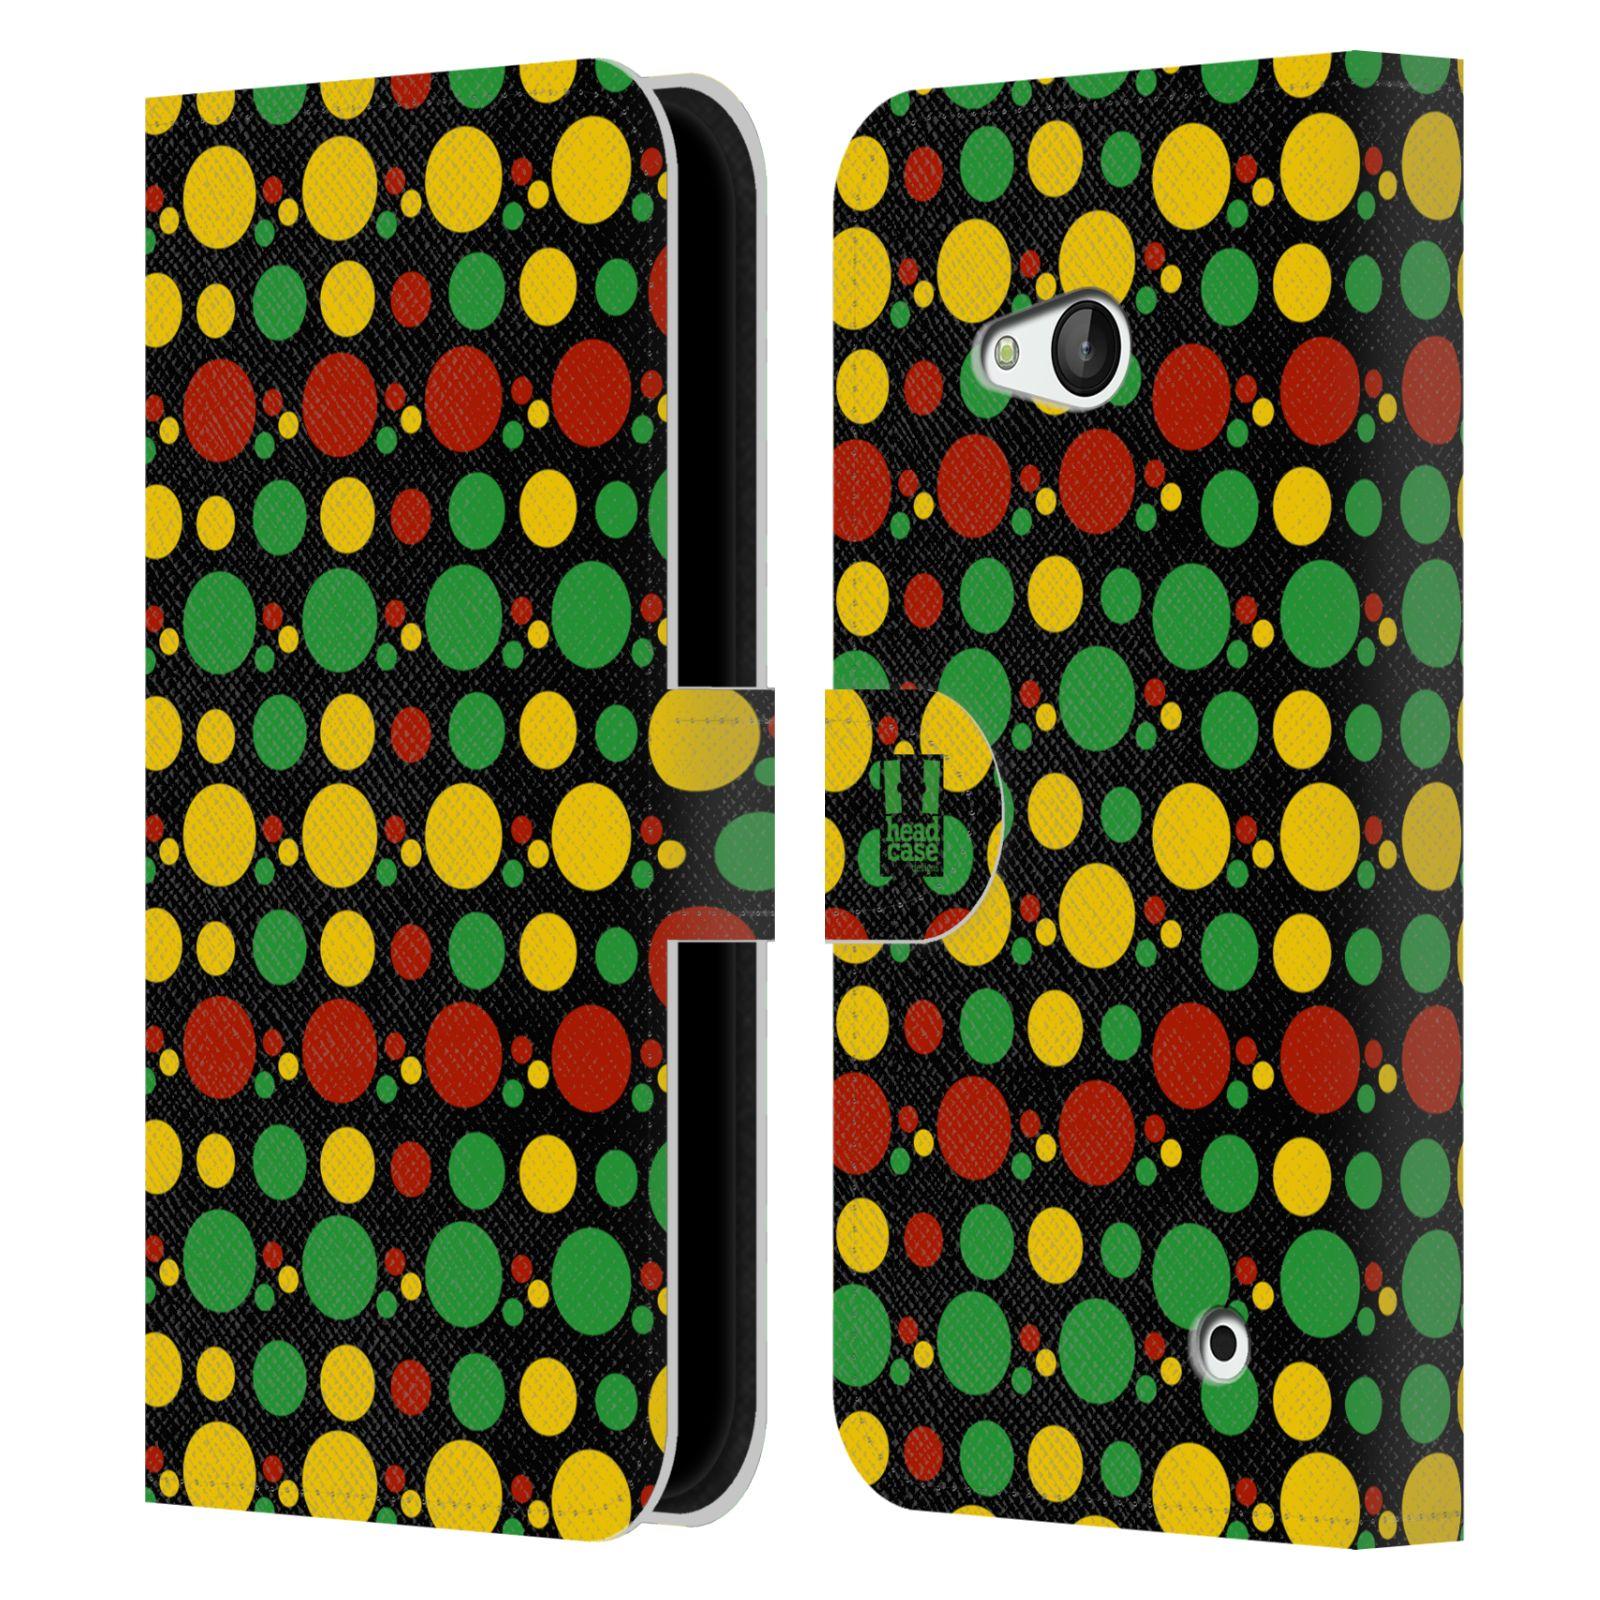 HEAD CASE Flipové pouzdro pro mobil NOKIA / MICROSOFT LUMIA 640 / LUMIA 640 DUAL Rastafariánský motiv Jamajka puntíky